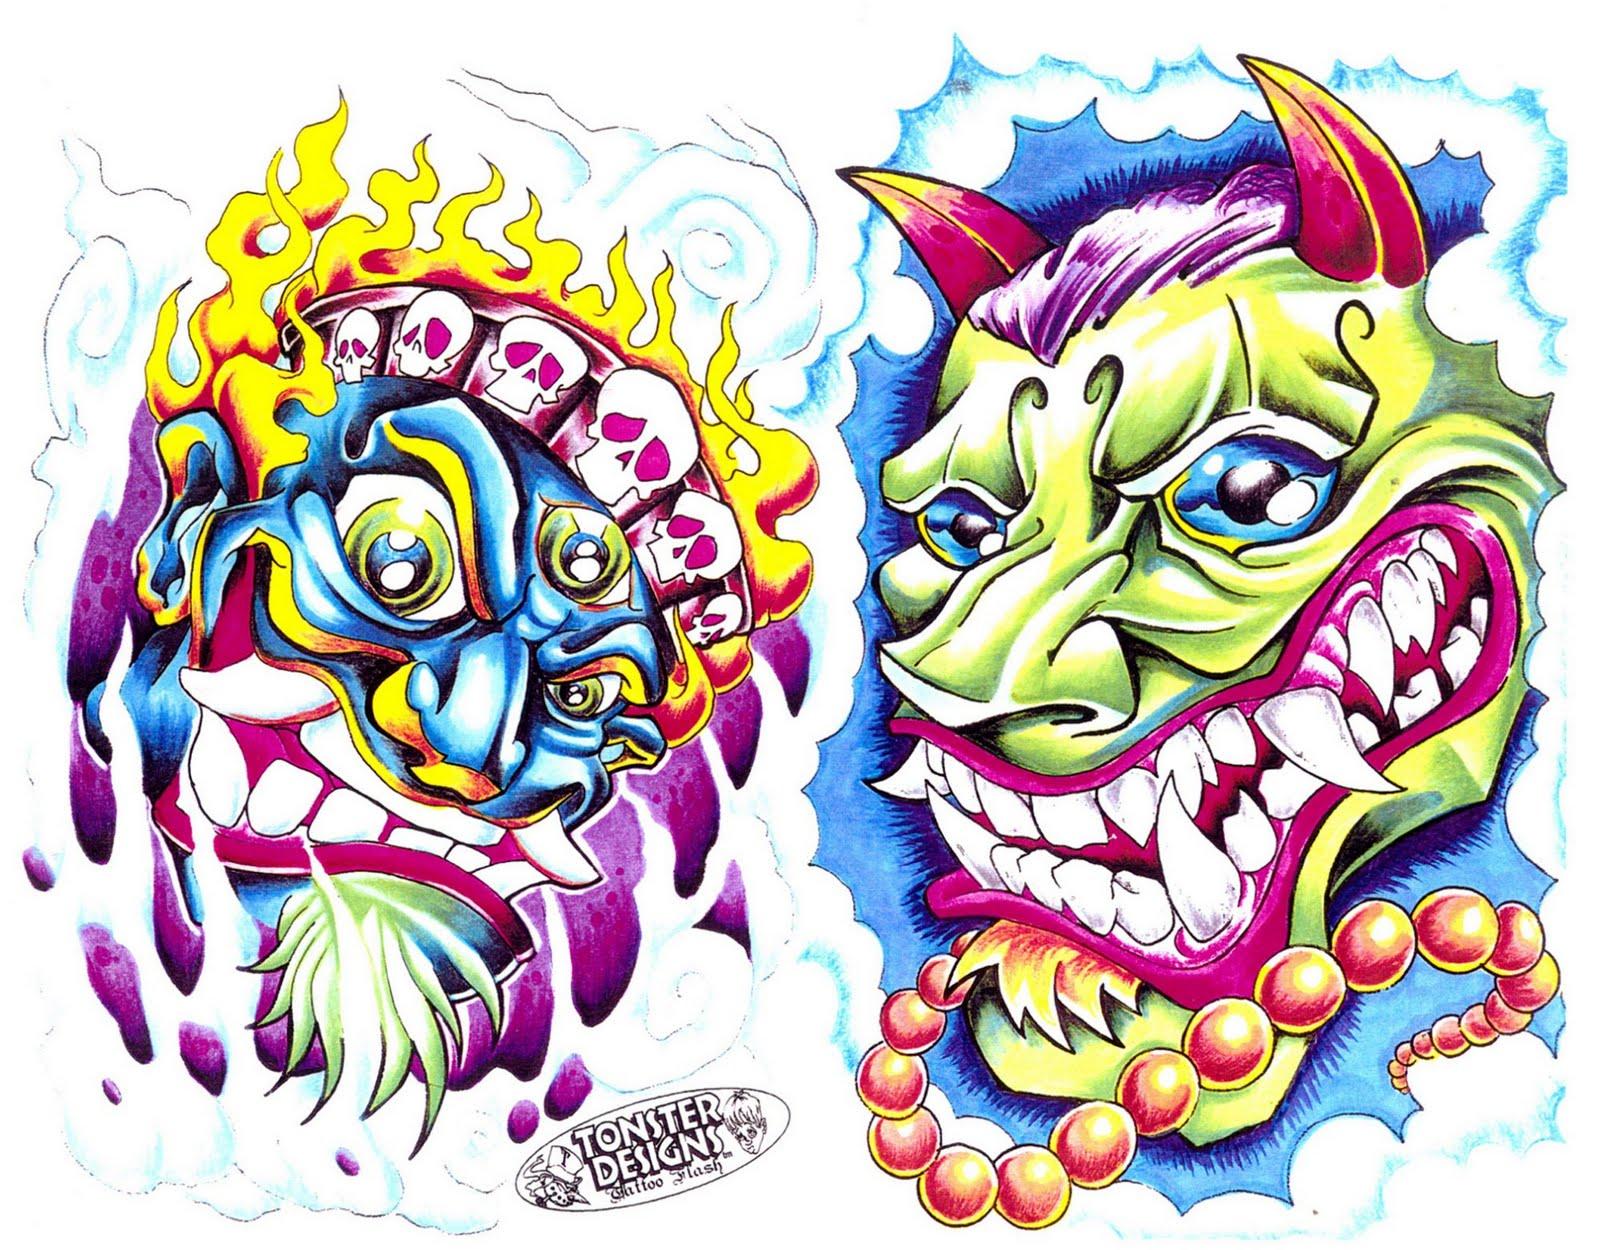 641 Free Hd I Flash Tattoo Design 2012 Your Art